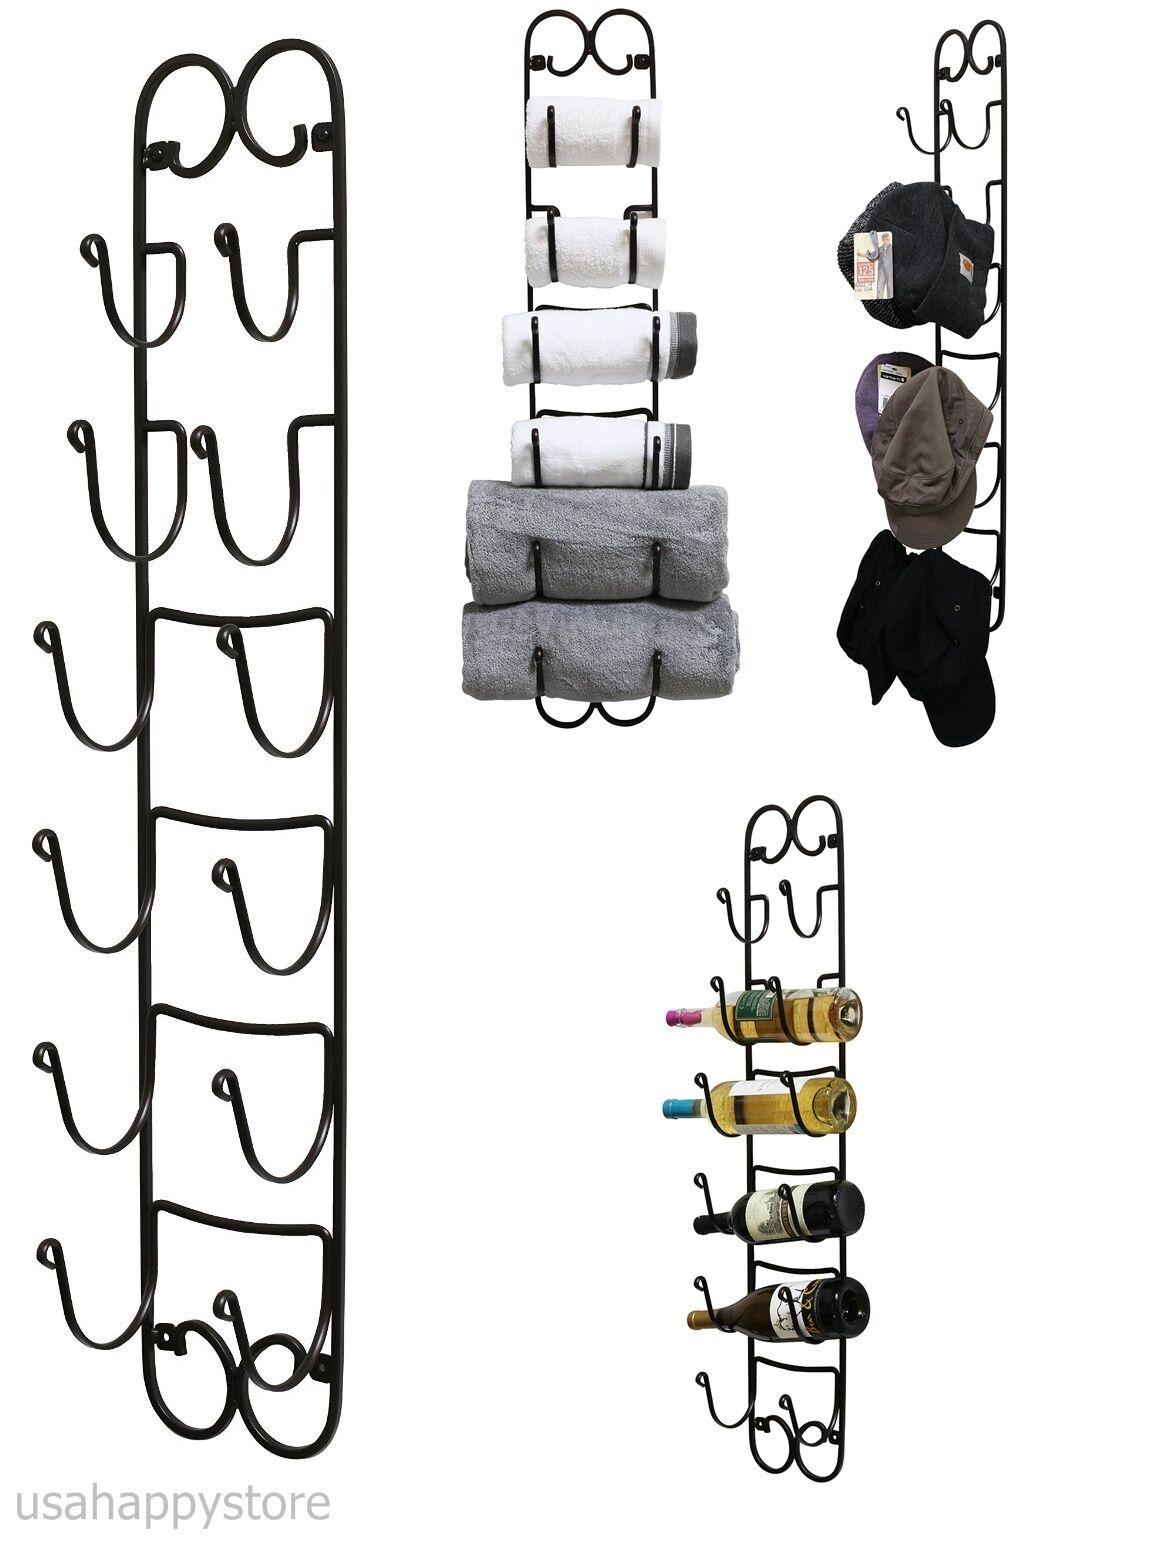 Towel wine hat rack wall mount bathroom holder display for Ways to hang hats on wall